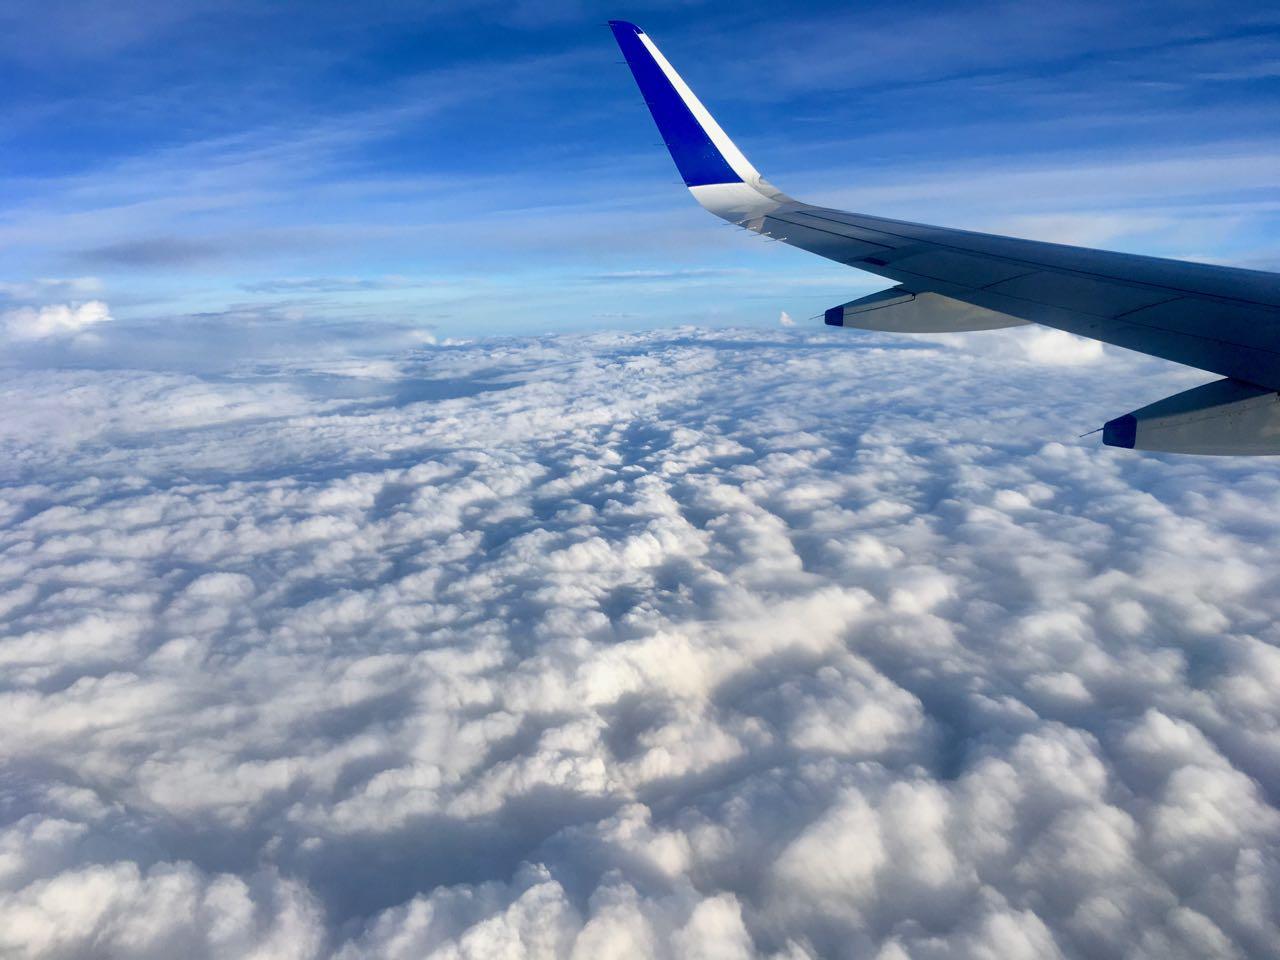 aeroplane-travelling-